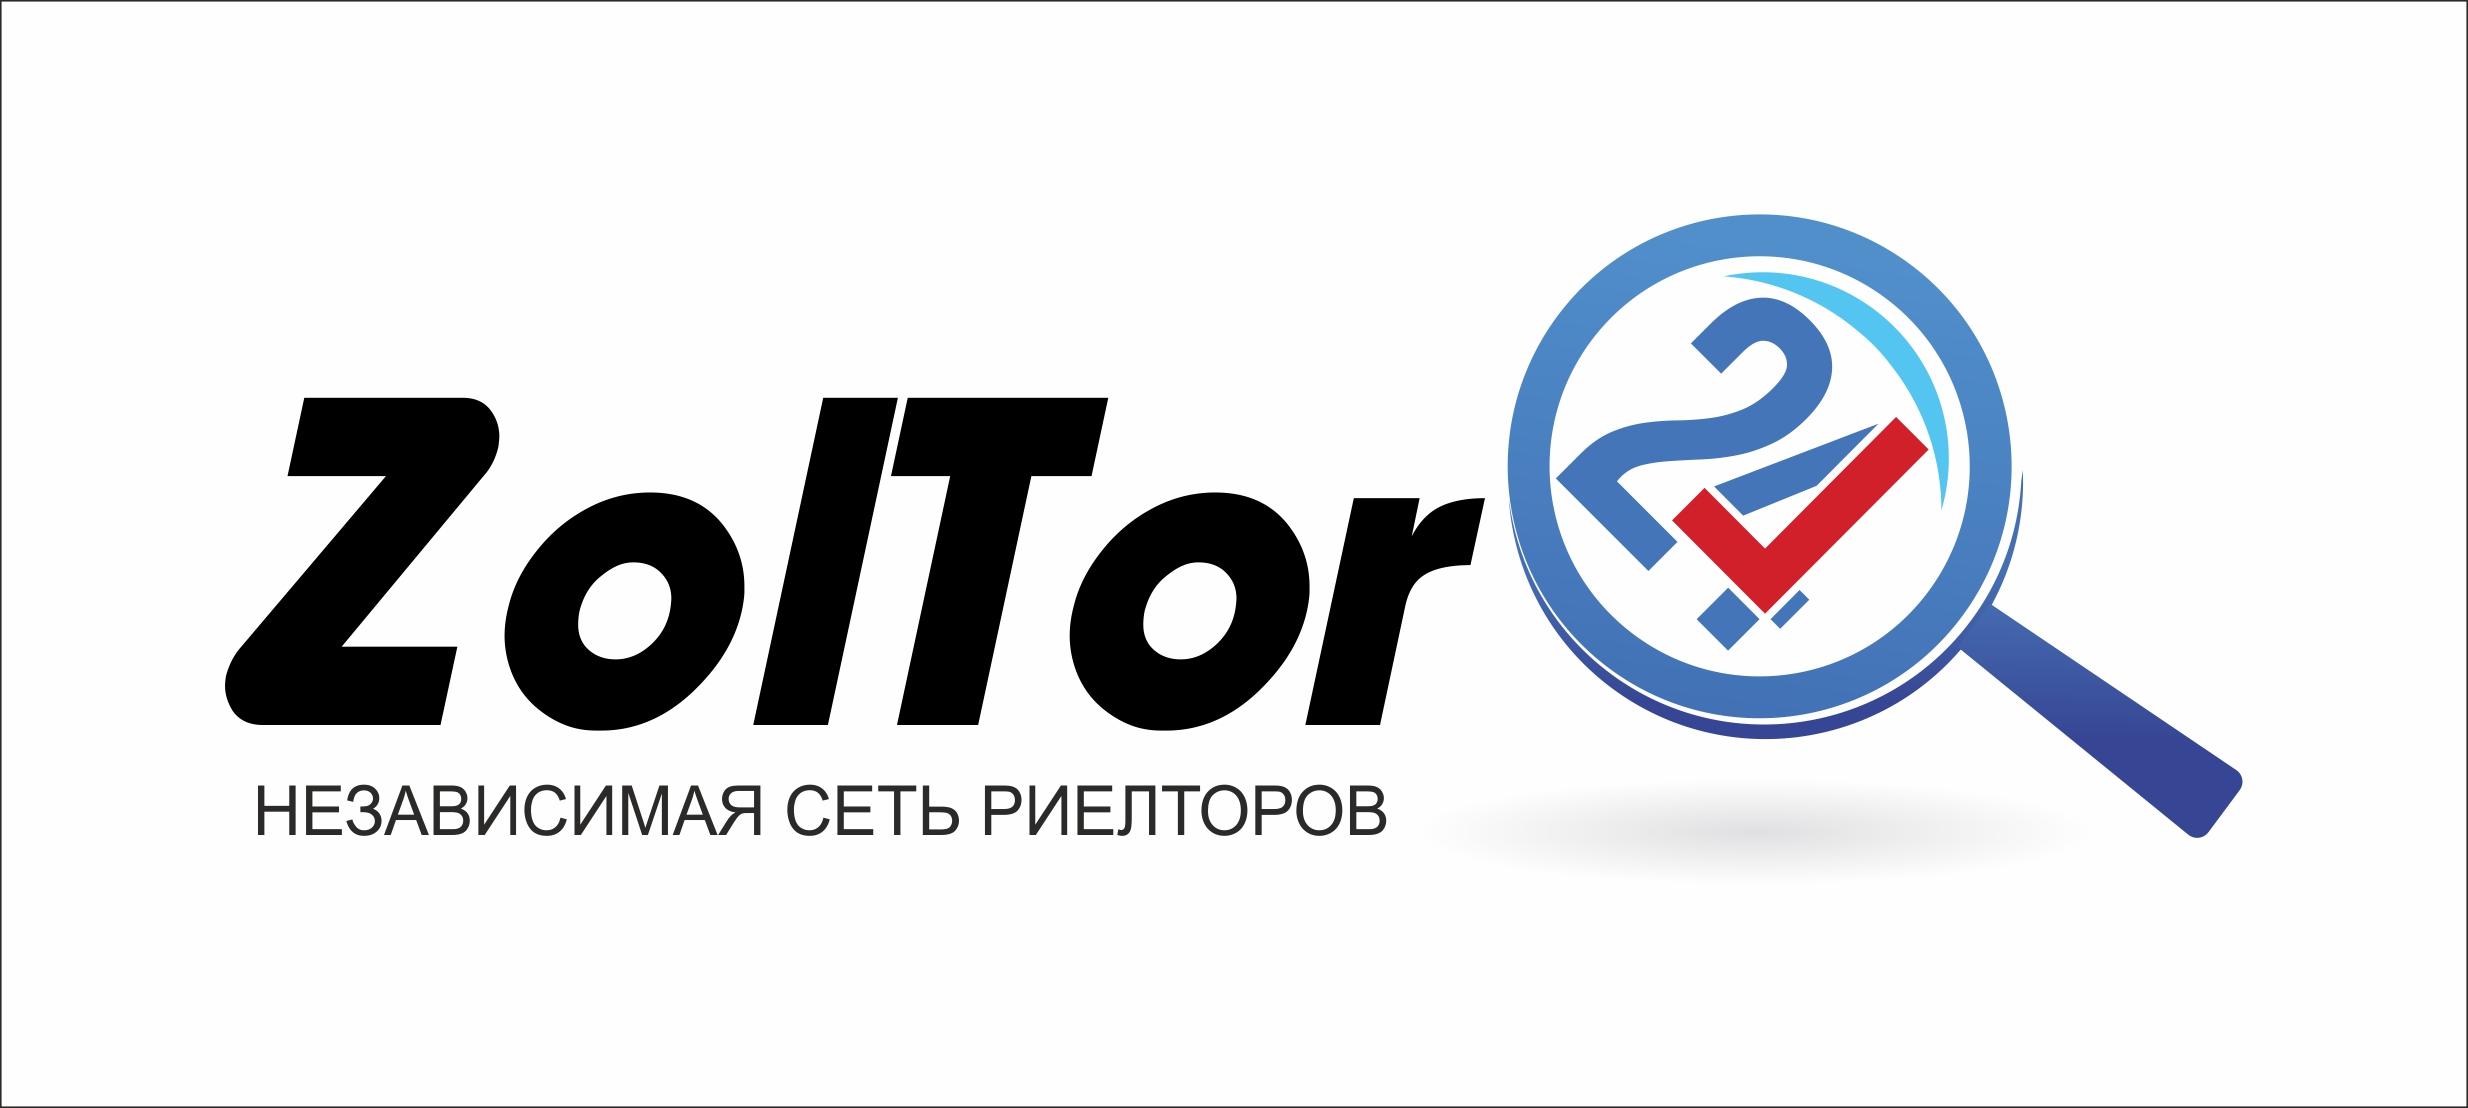 Логотип и фирменный стиль ZolTor24 фото f_3245c96143819a88.jpg